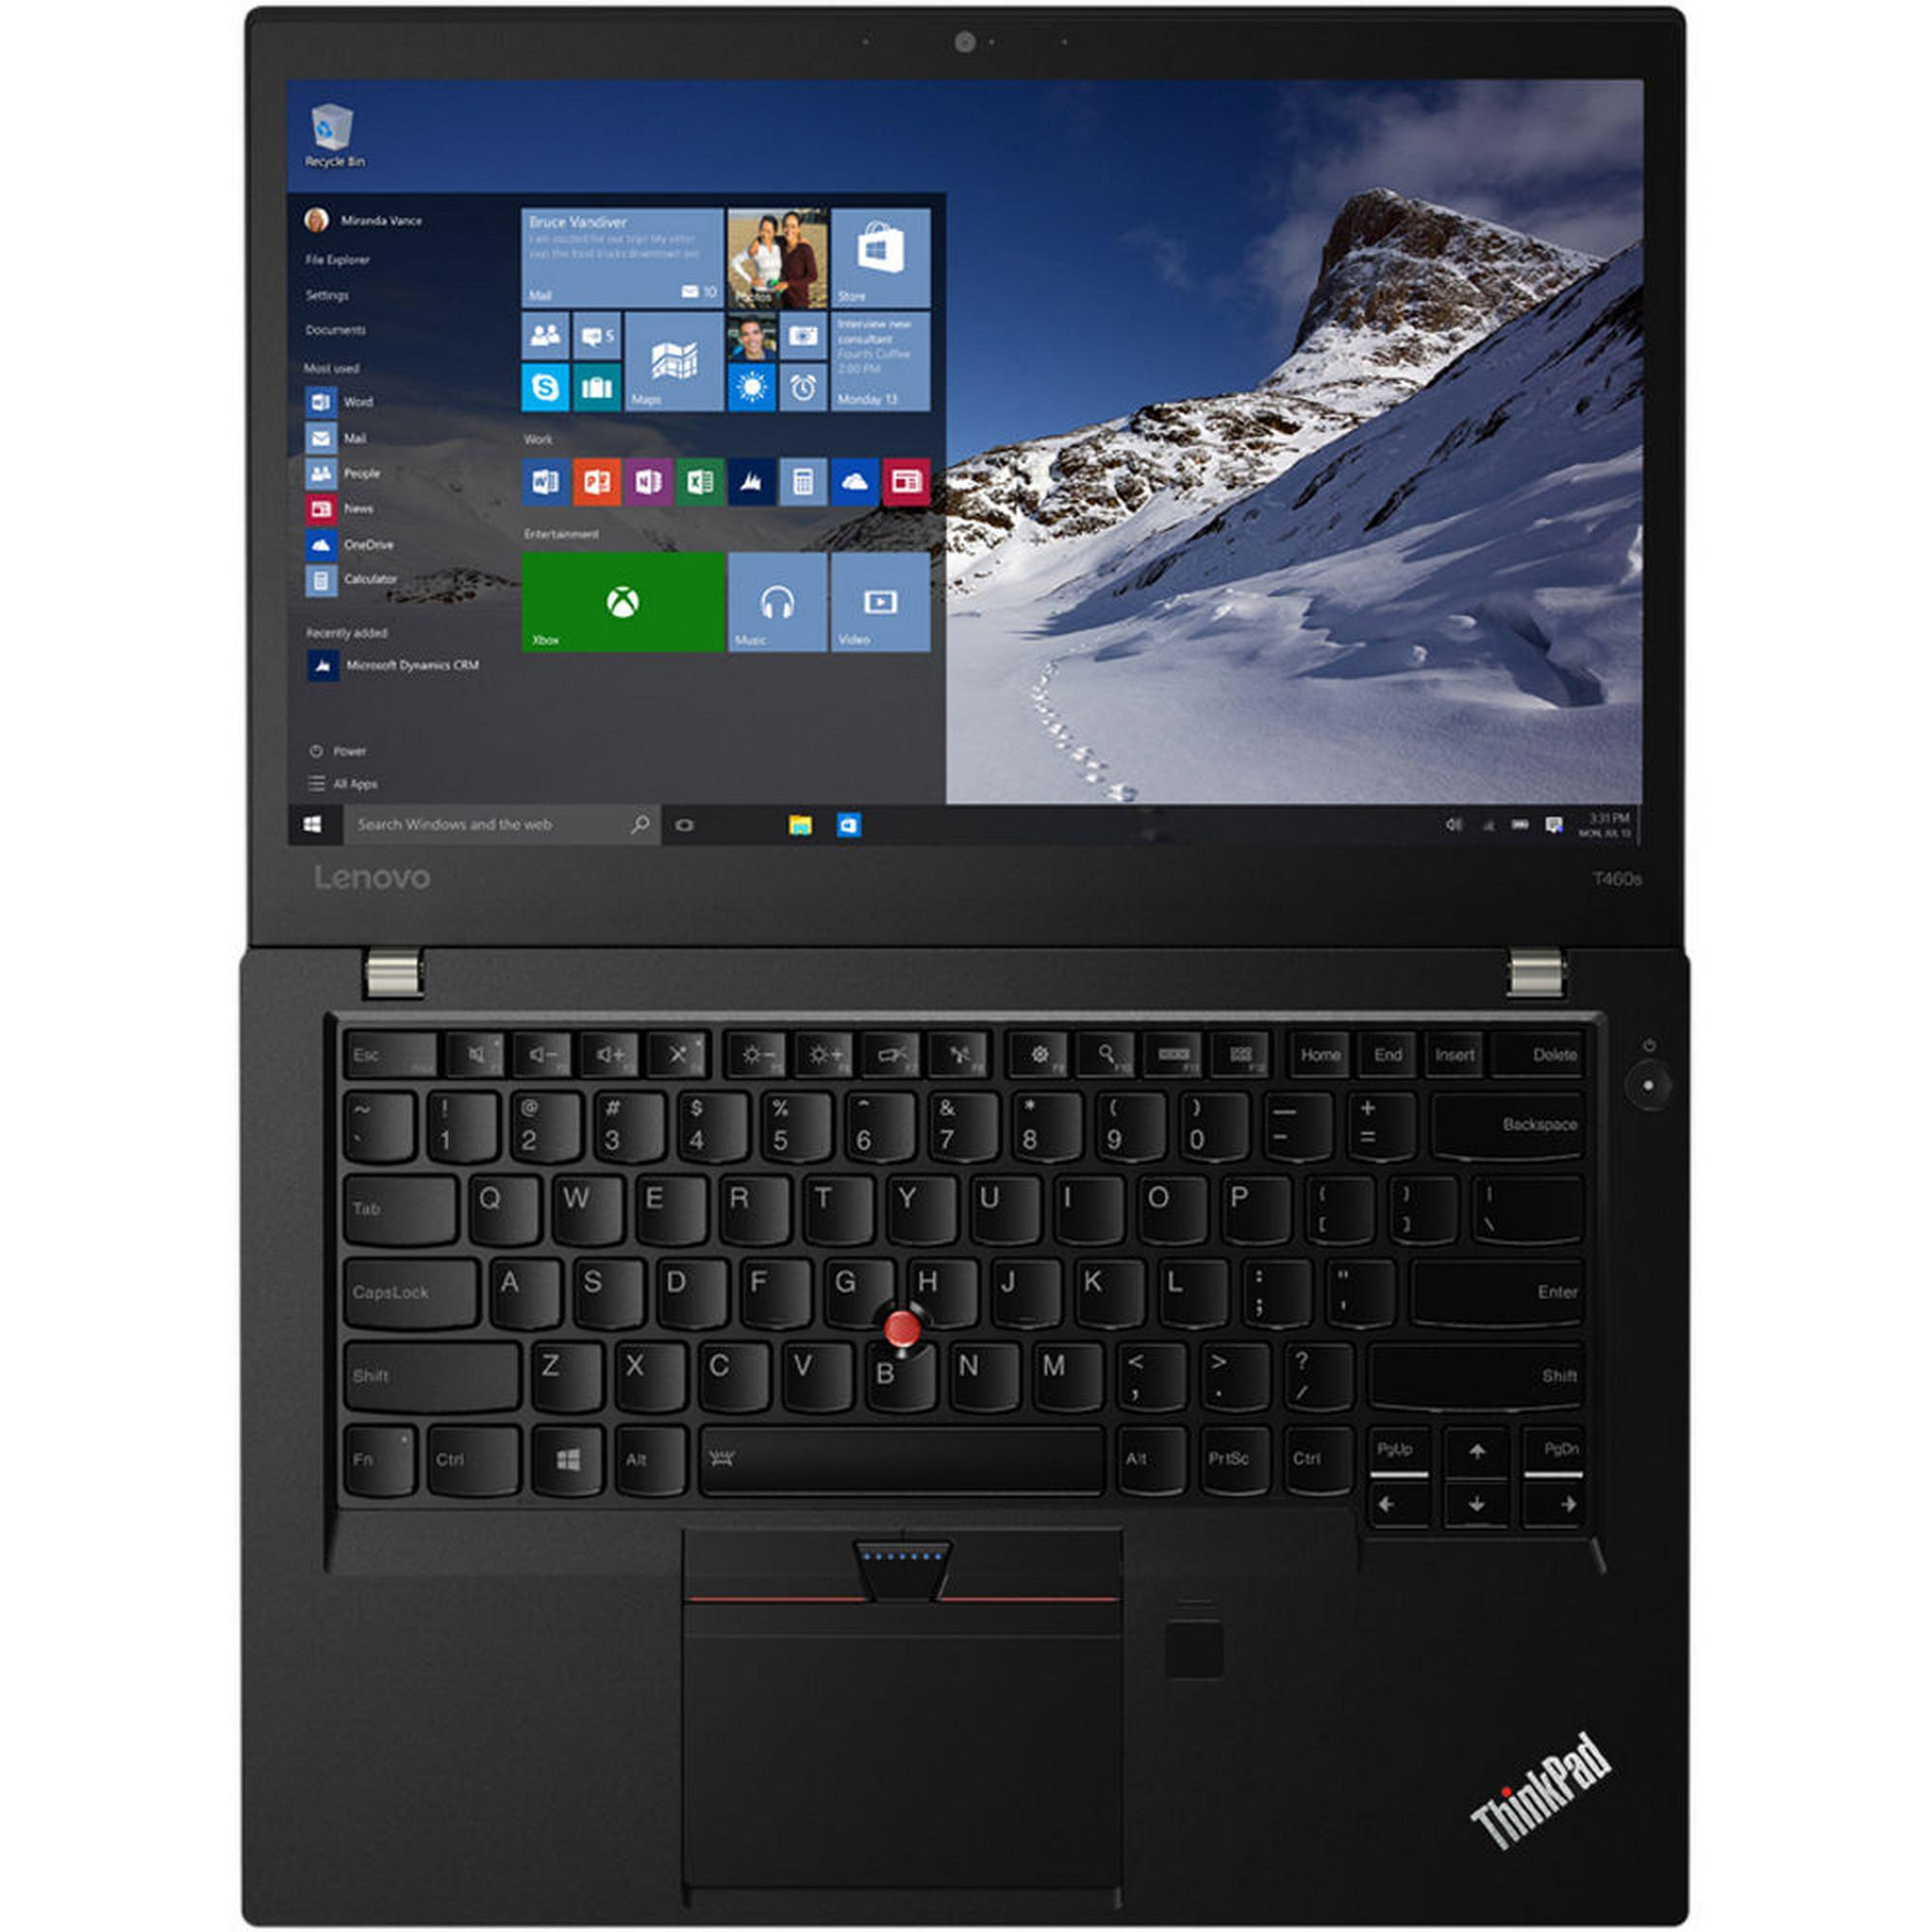 Lenovo ThinkPad T460S 14-inch (2016) - Core i5-6300U - 8 GB - SSD 256 GB